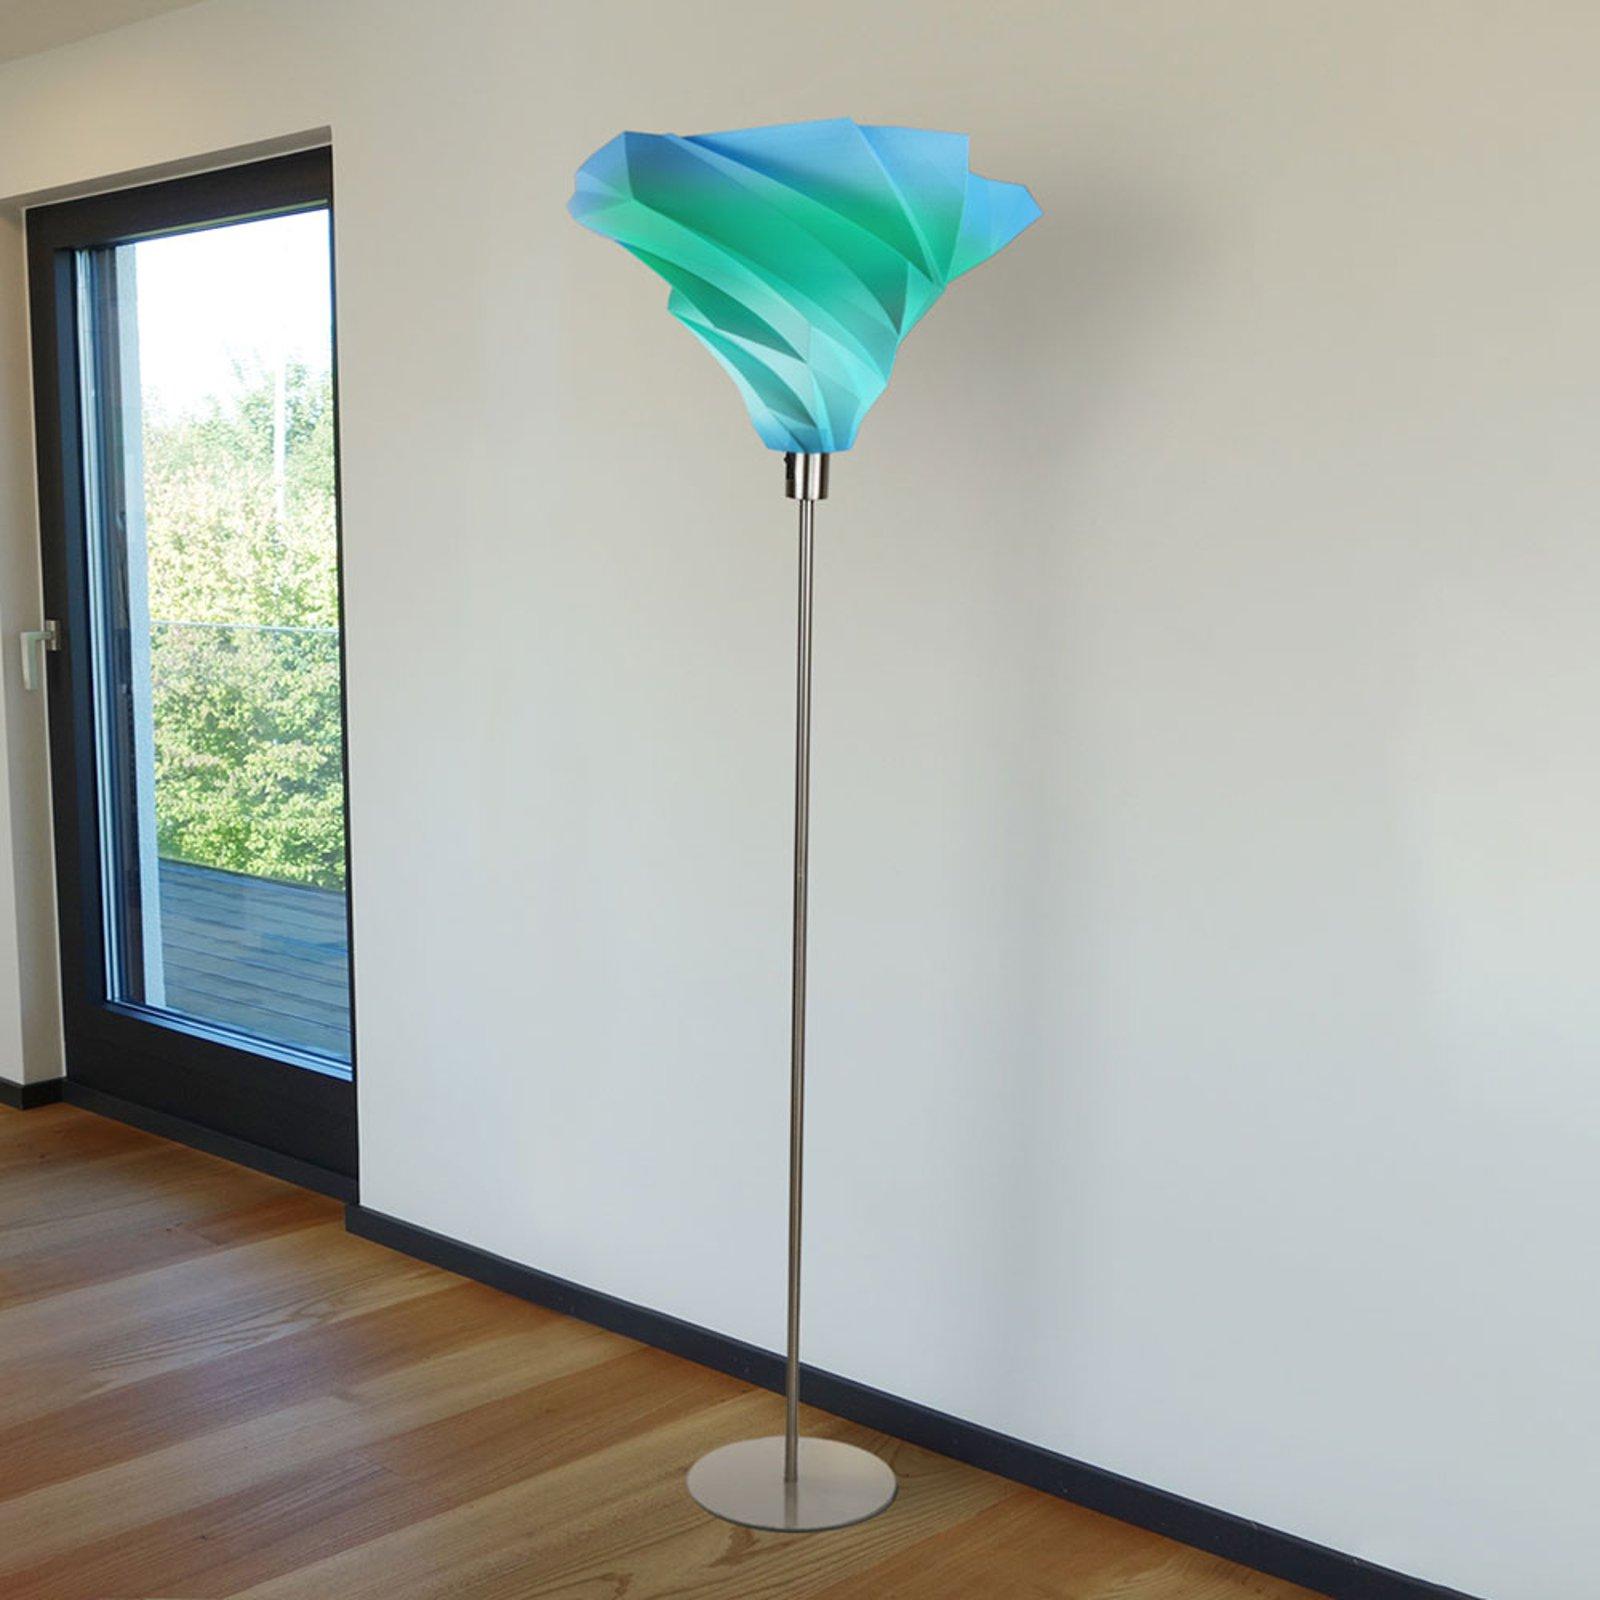 Twister designer-gulvlampe Ø 30cm flerfarget